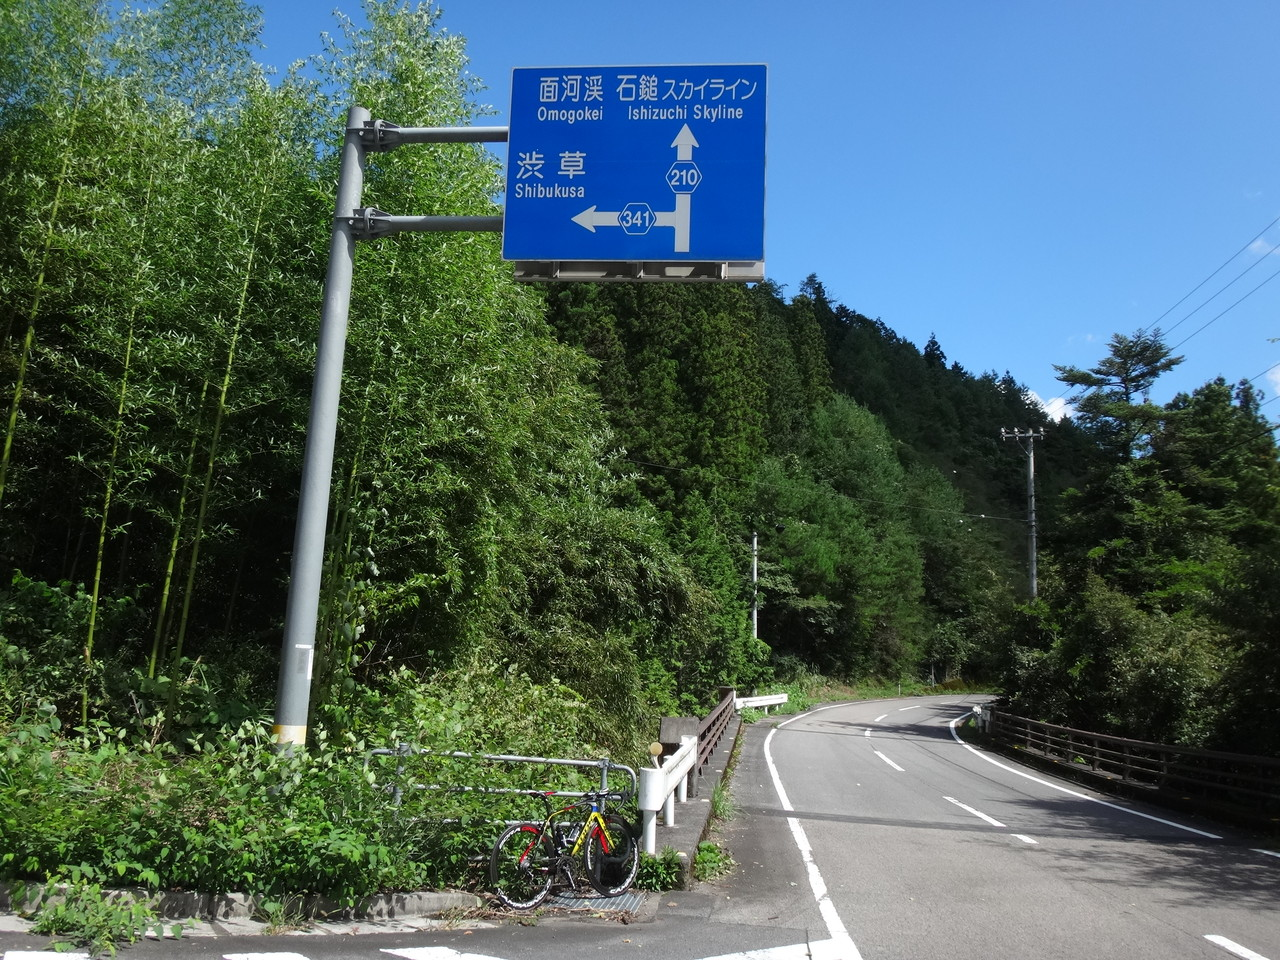 cfd33101.jpg